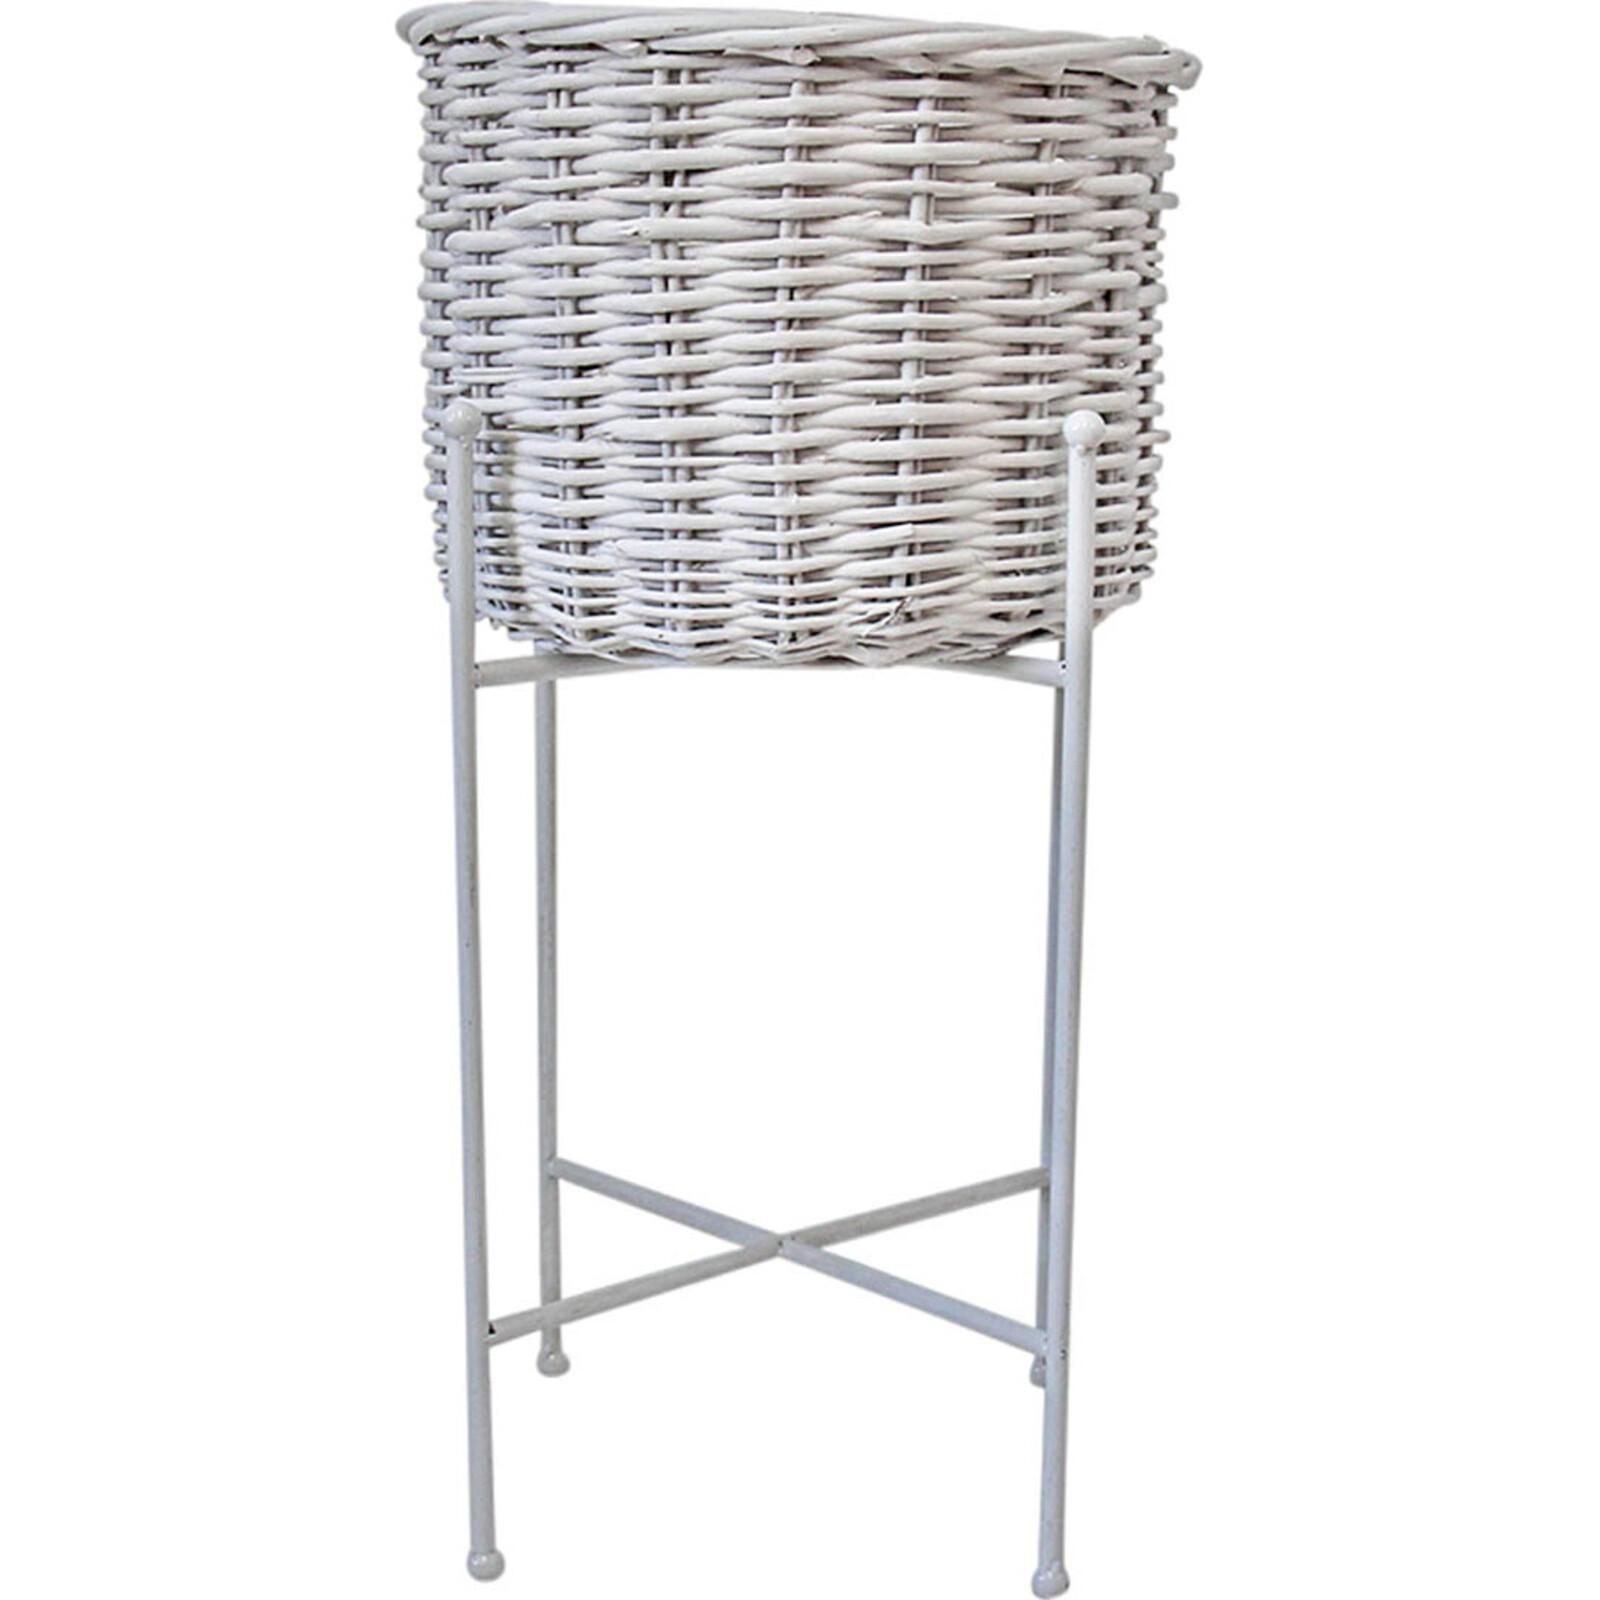 Planter Basket White Lrg